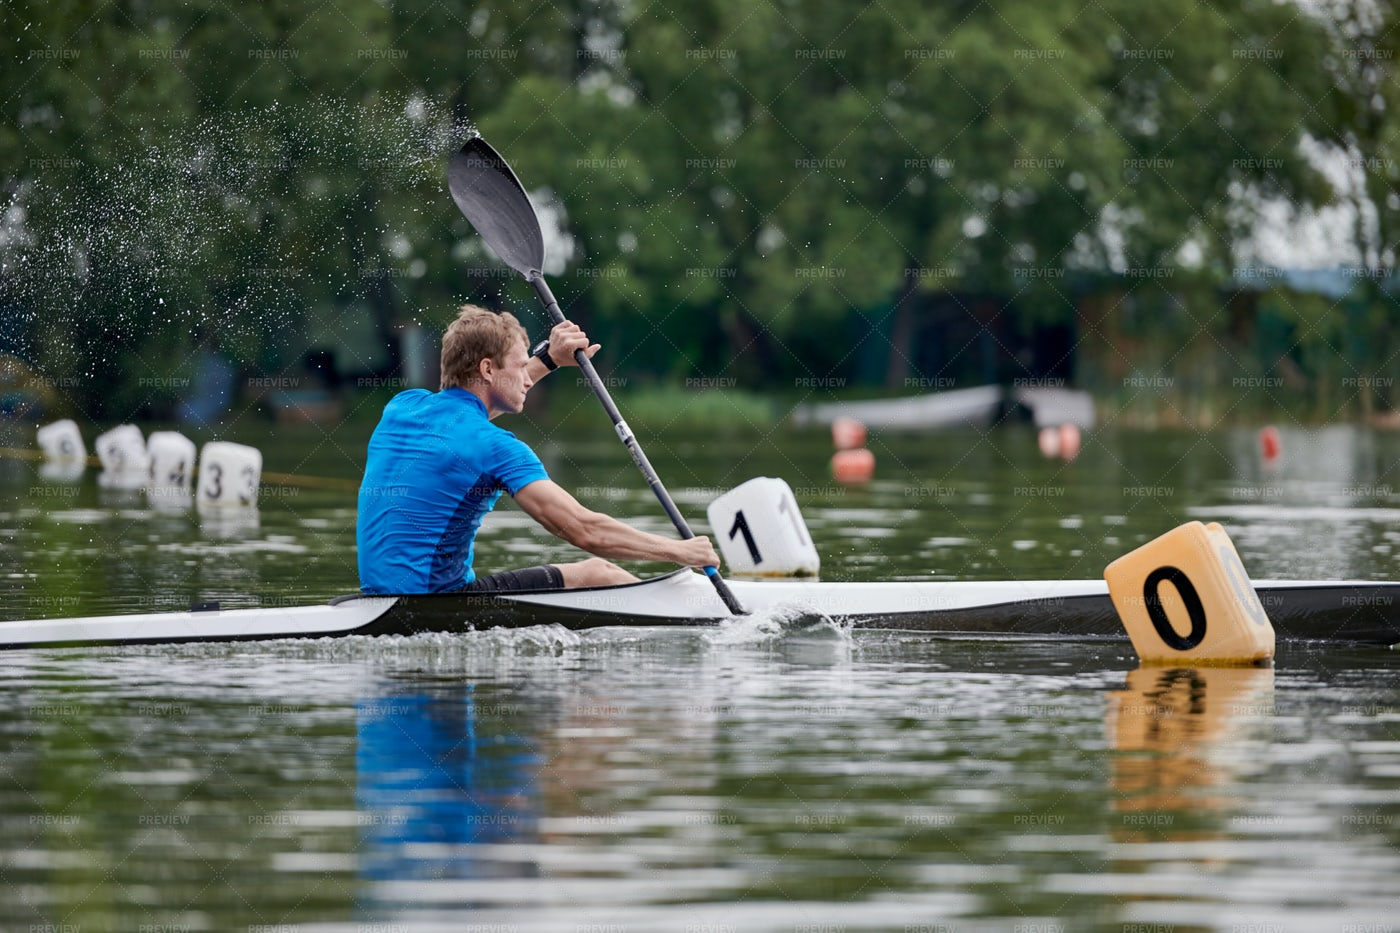 Paddler Racing On The Lake: Stock Photos